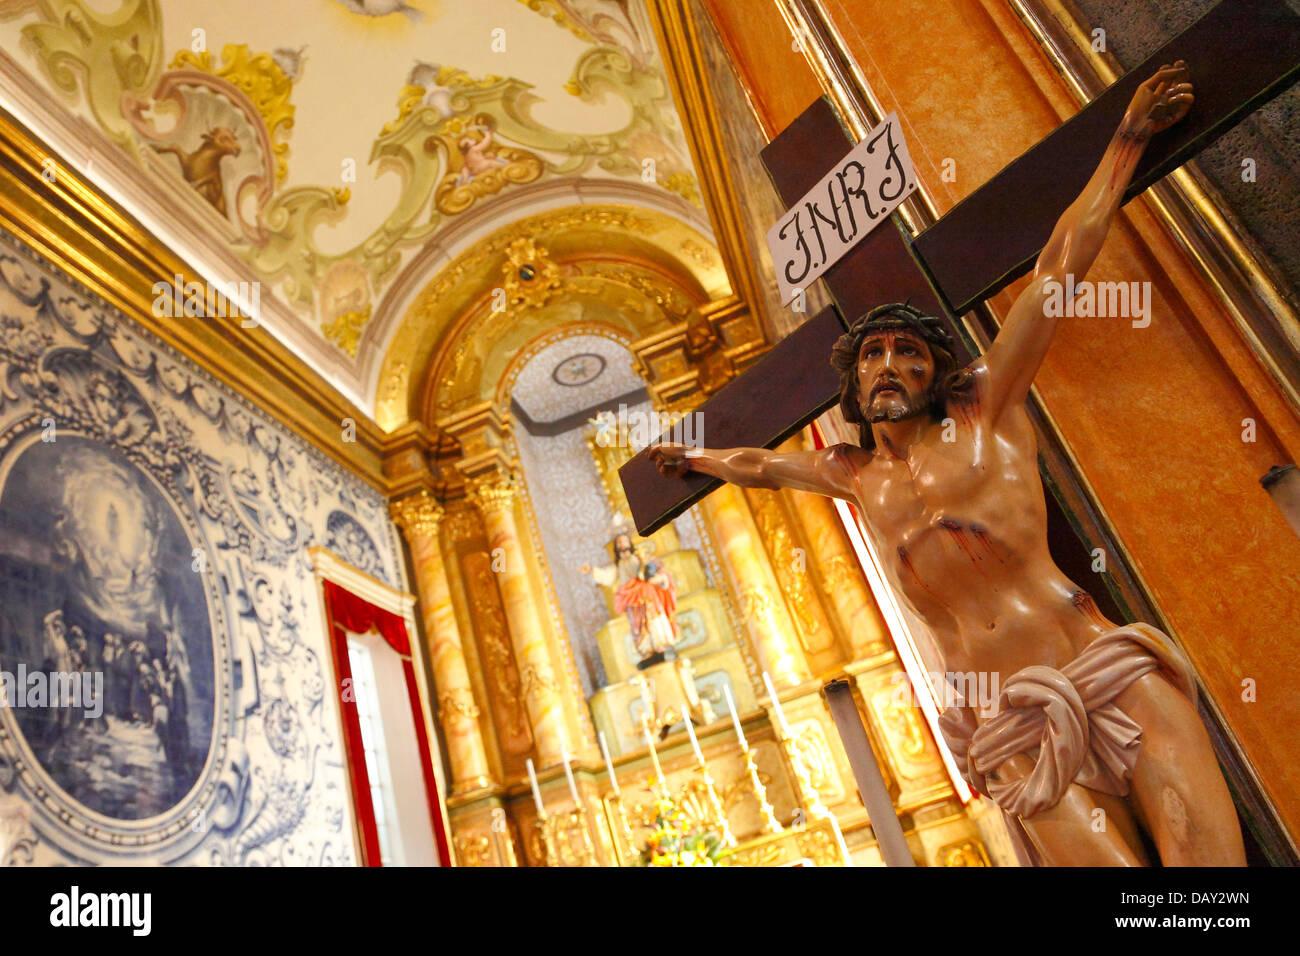 Inside the church in the parish of Ribeirinha, Sao Miguel island, Azores, Portugal - Stock Image